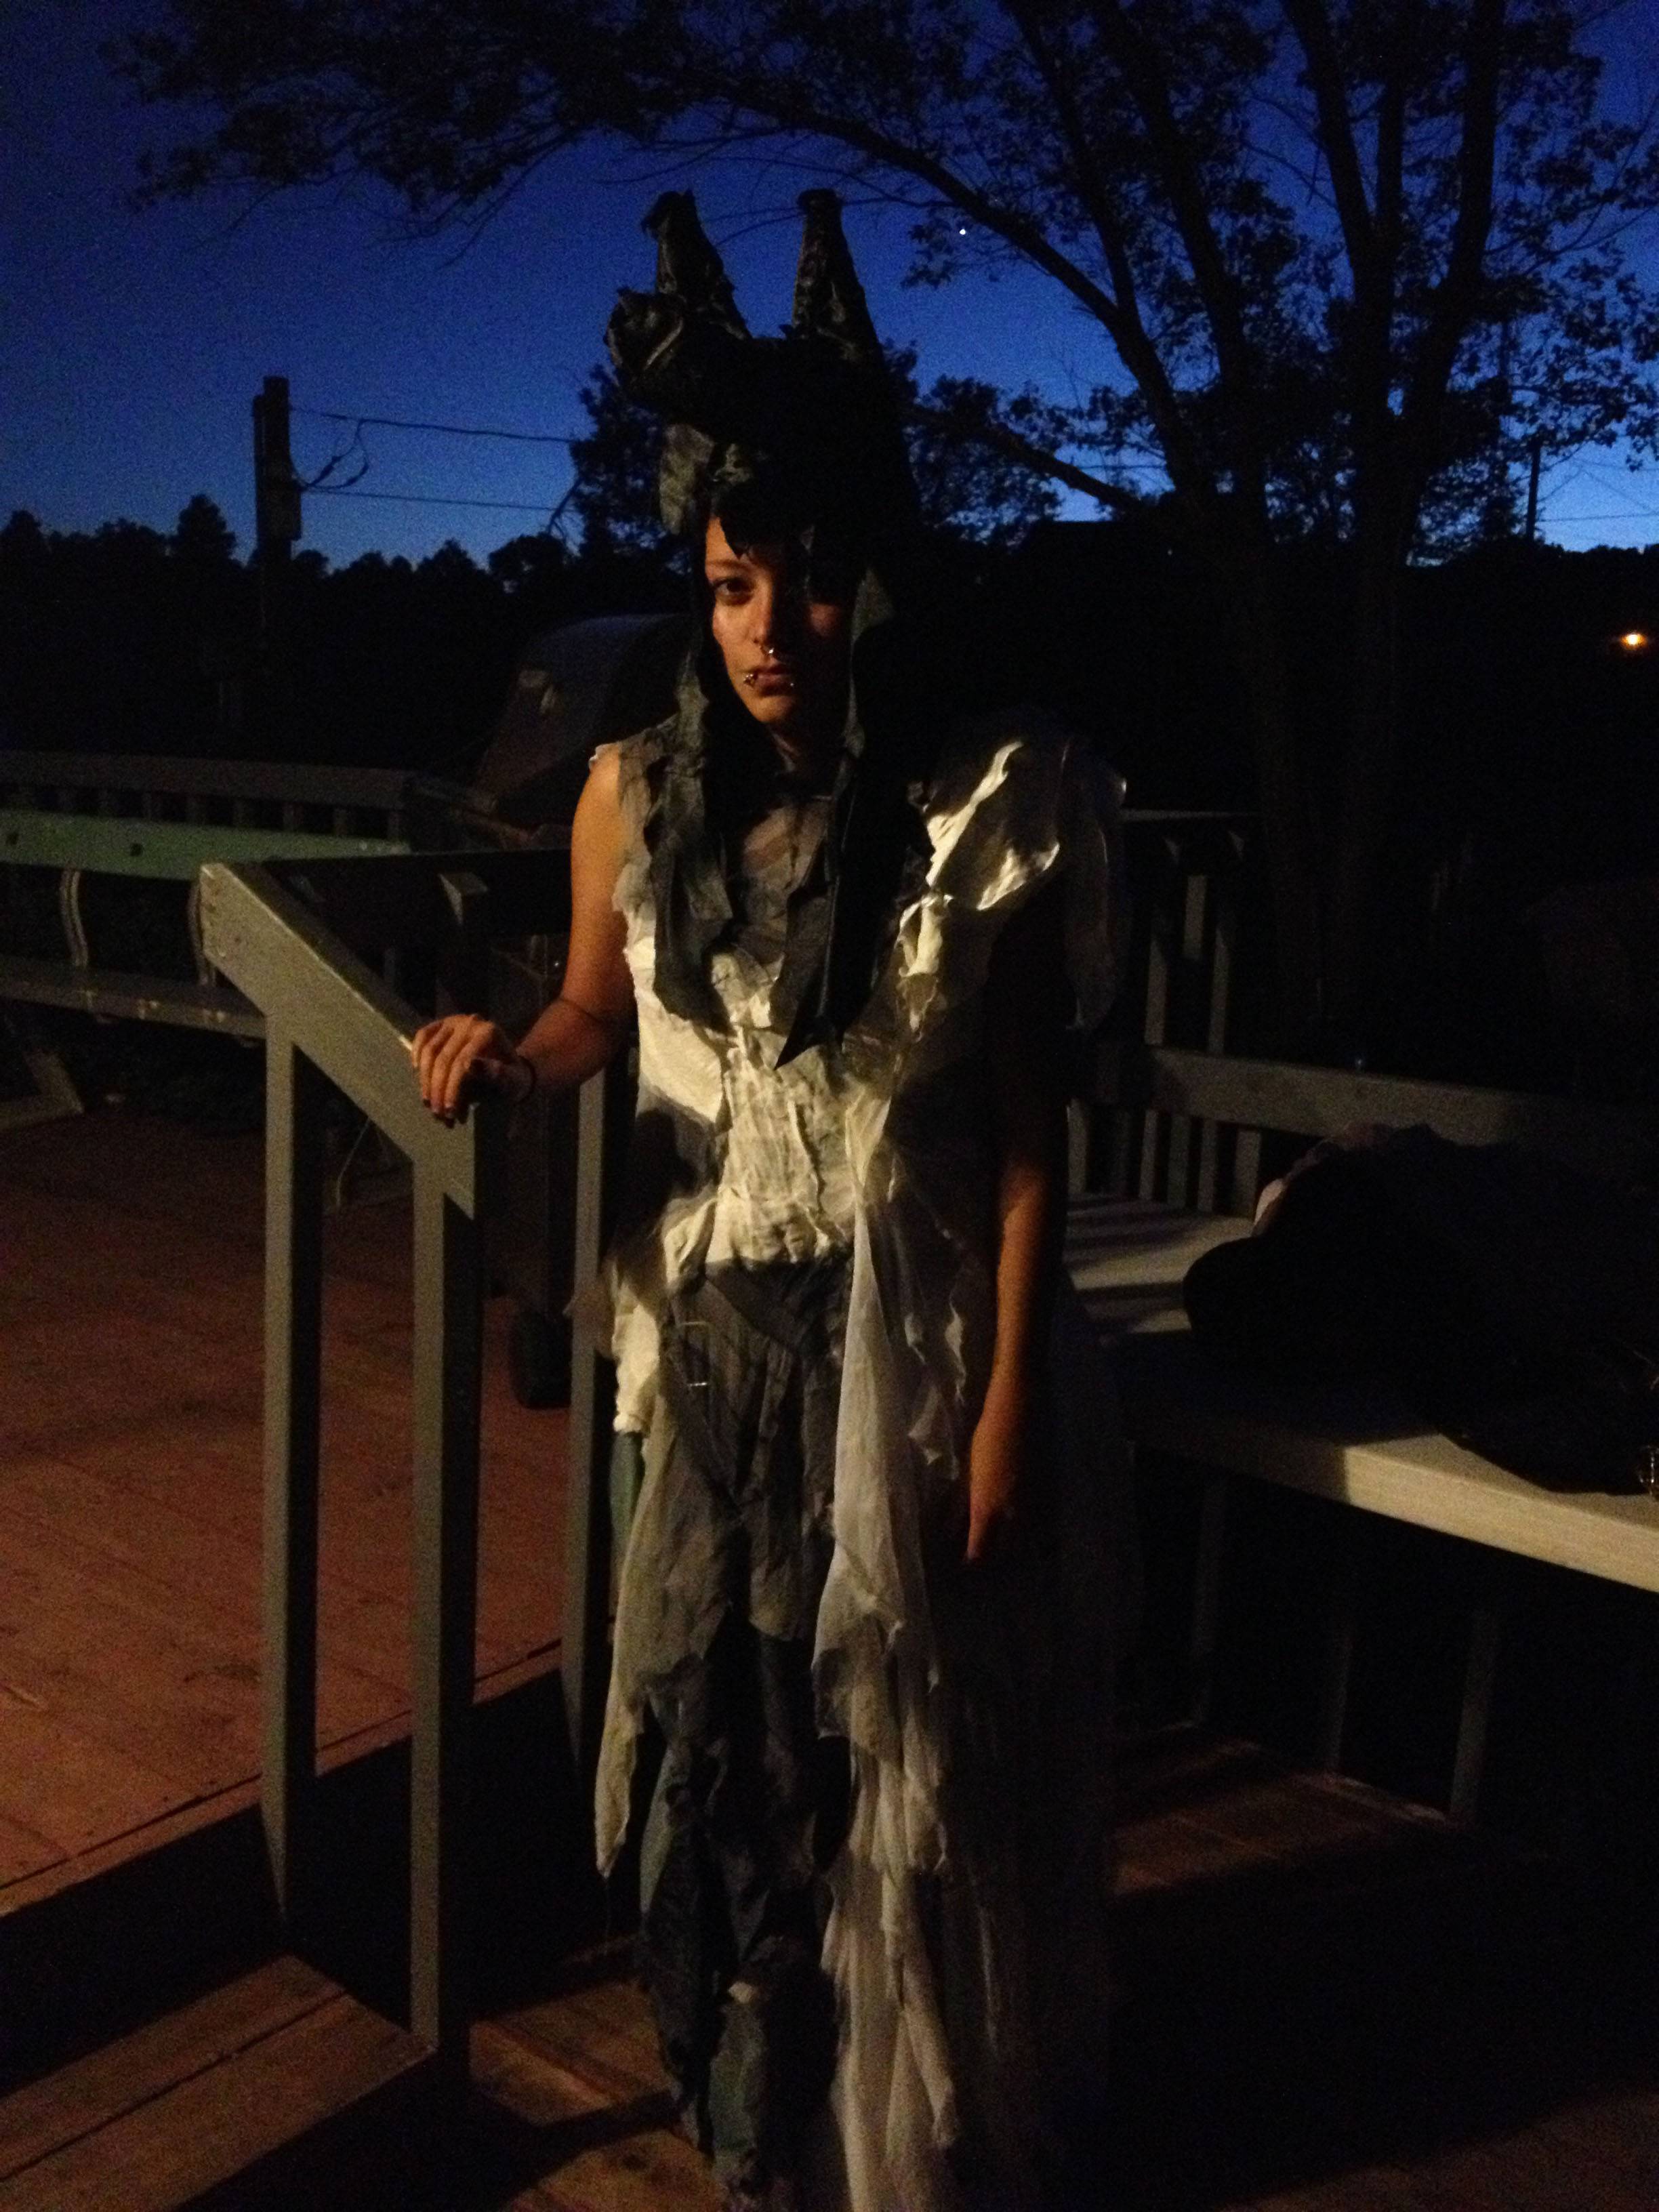 Felicity brown fashion black silk wolf head white silk dress native american  arizona trip .jpg